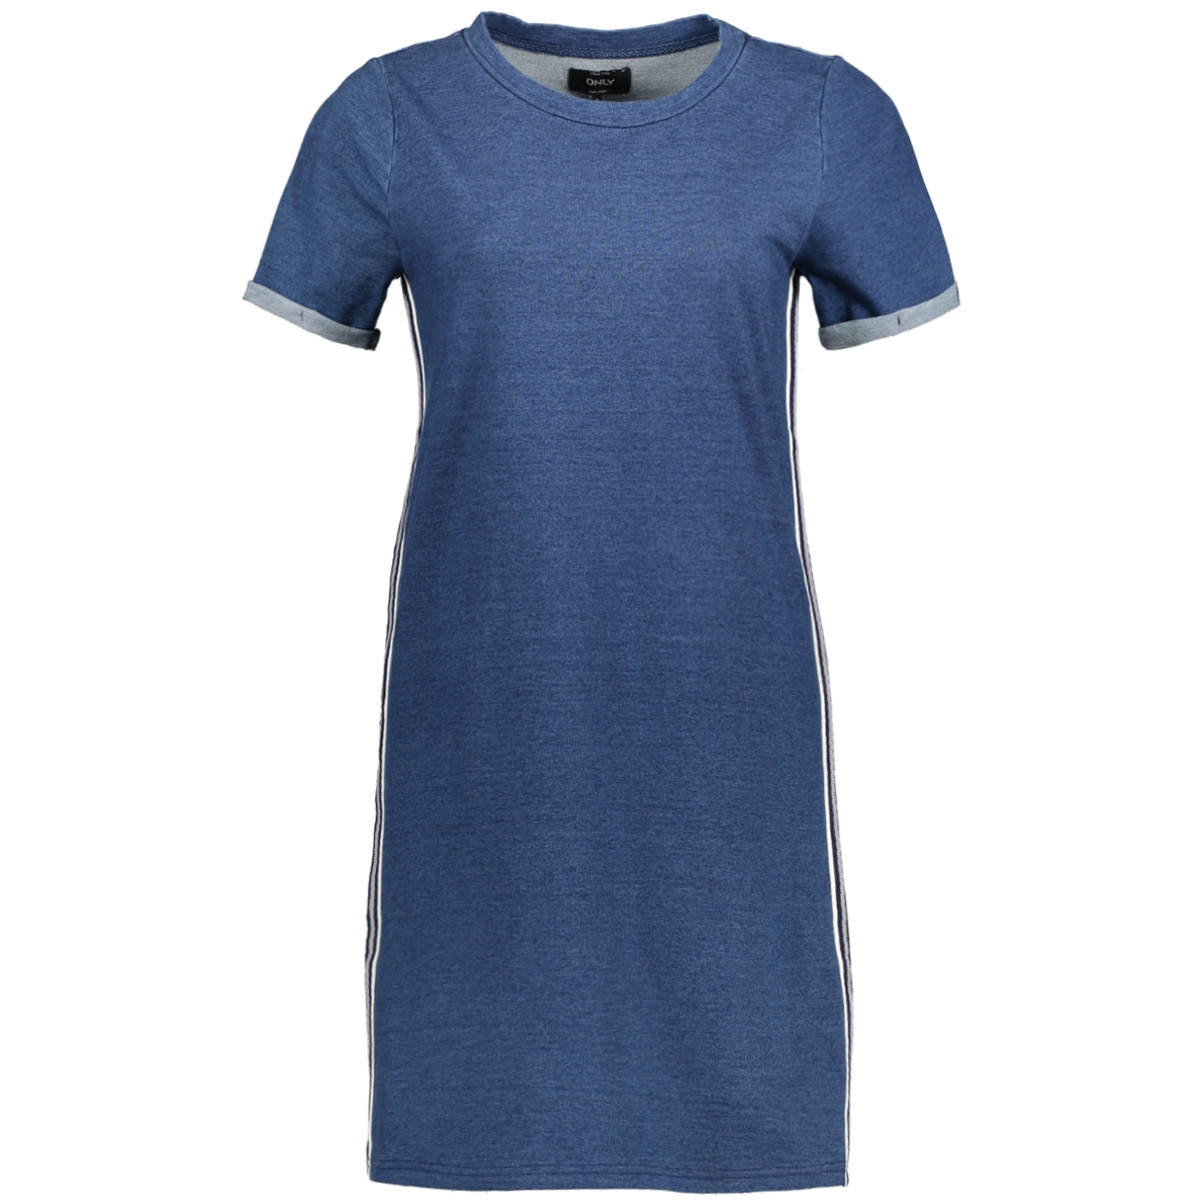 onlcarol s/s dress swt 15135508 only jurk dark blue denim